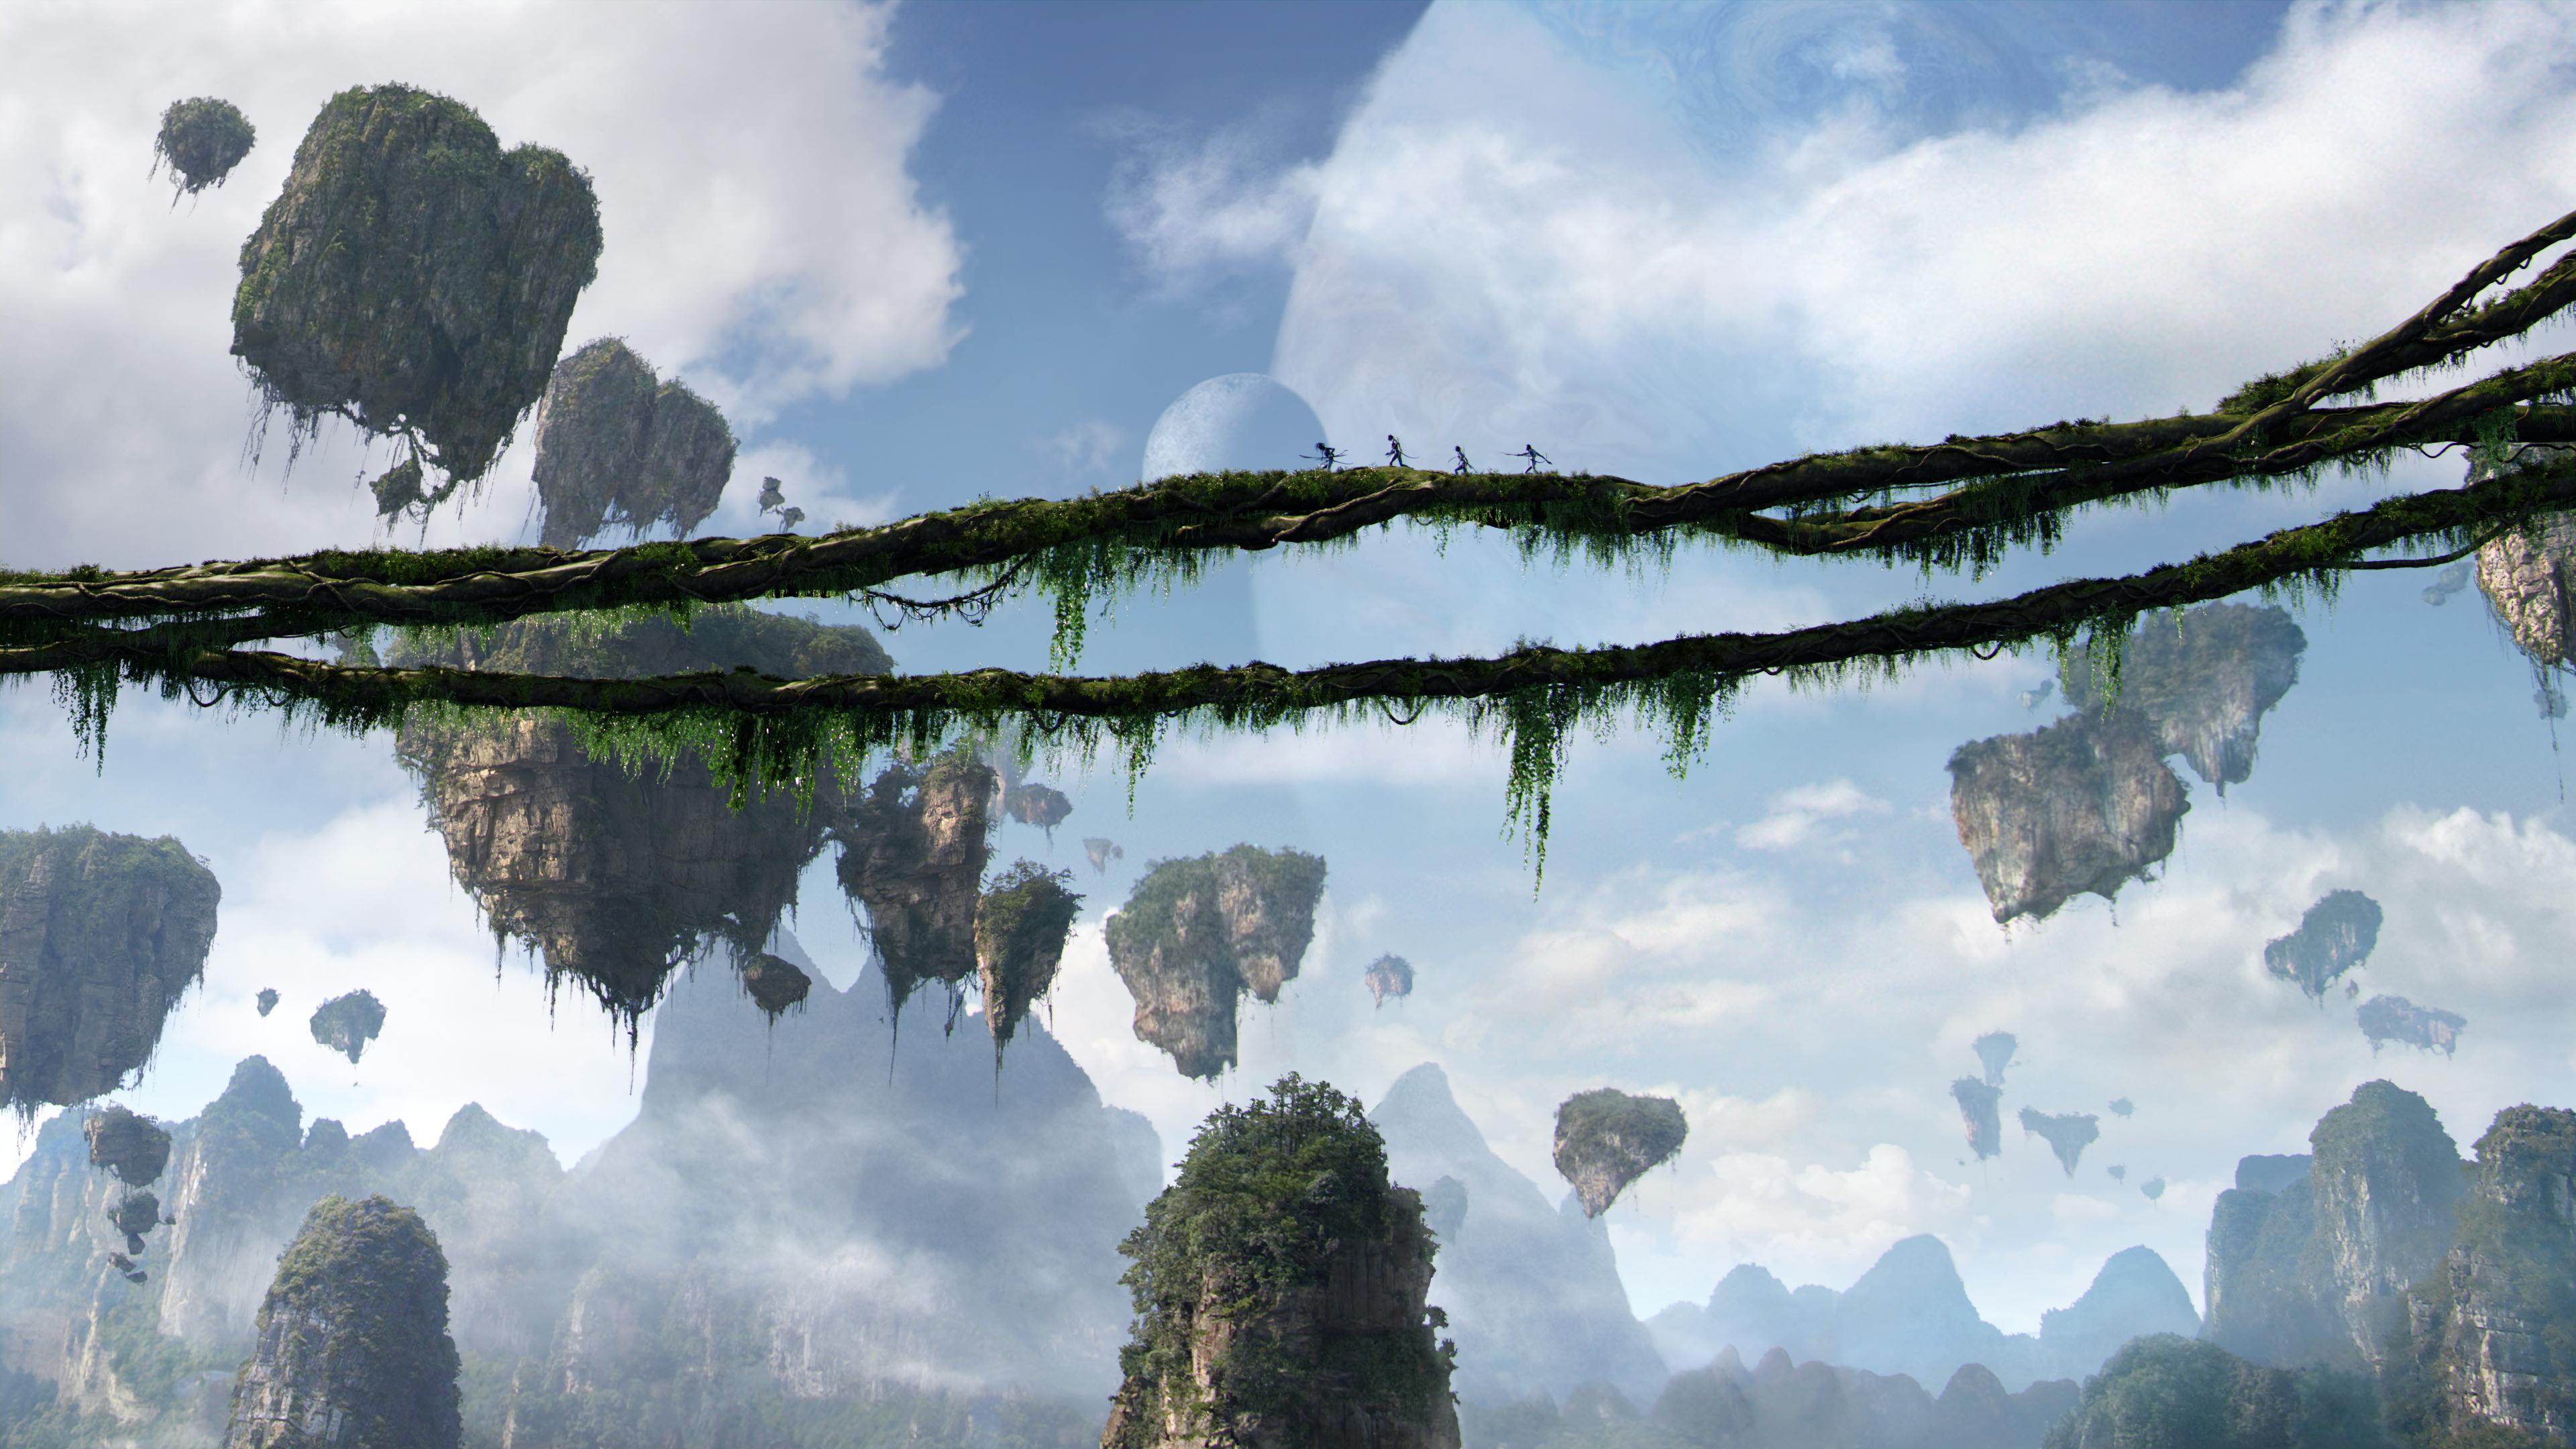 Walt Disney World - Avatar 2017-05-28 17:03